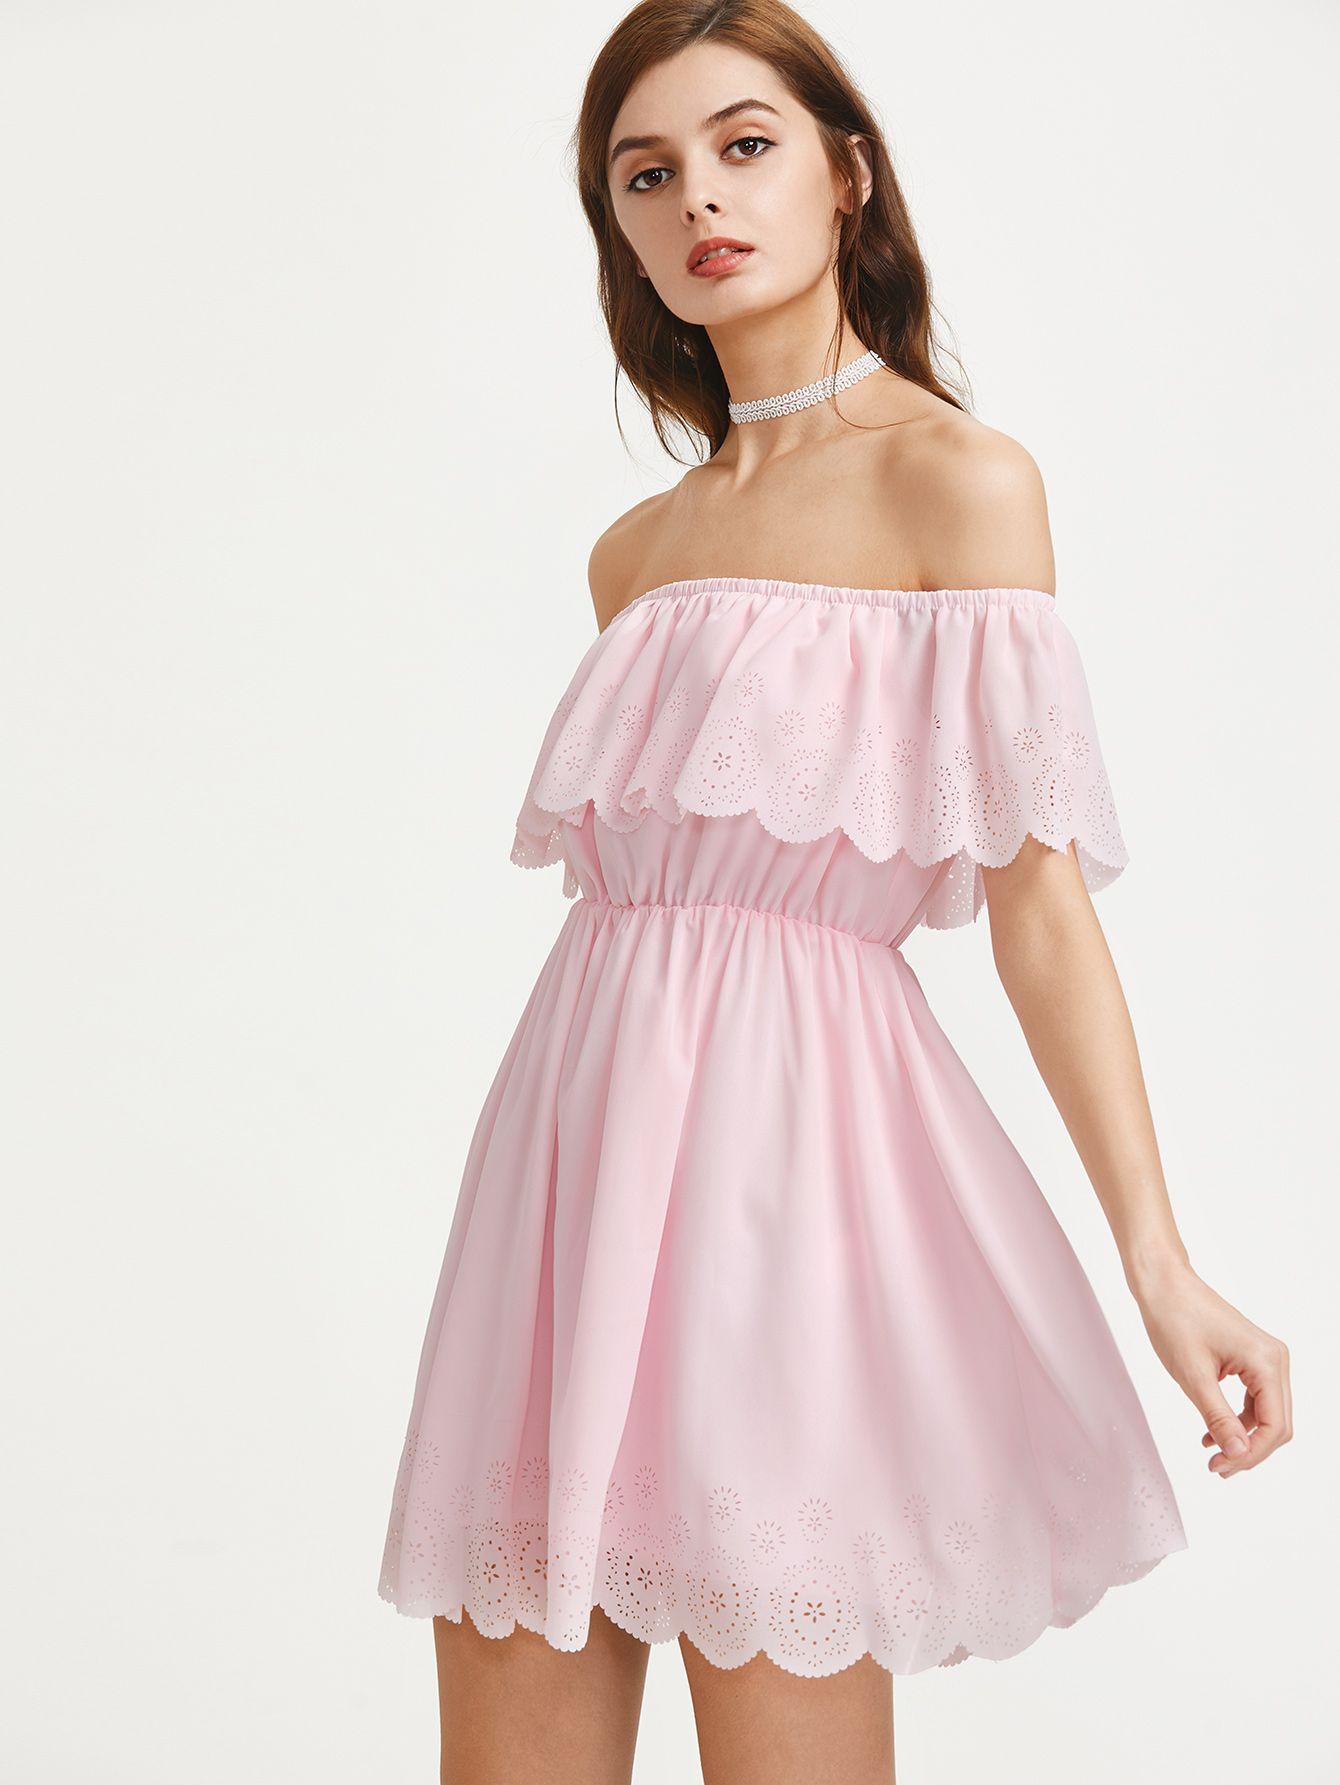 Scallop edge laser cut flounce bardot dress shops dresses and cats